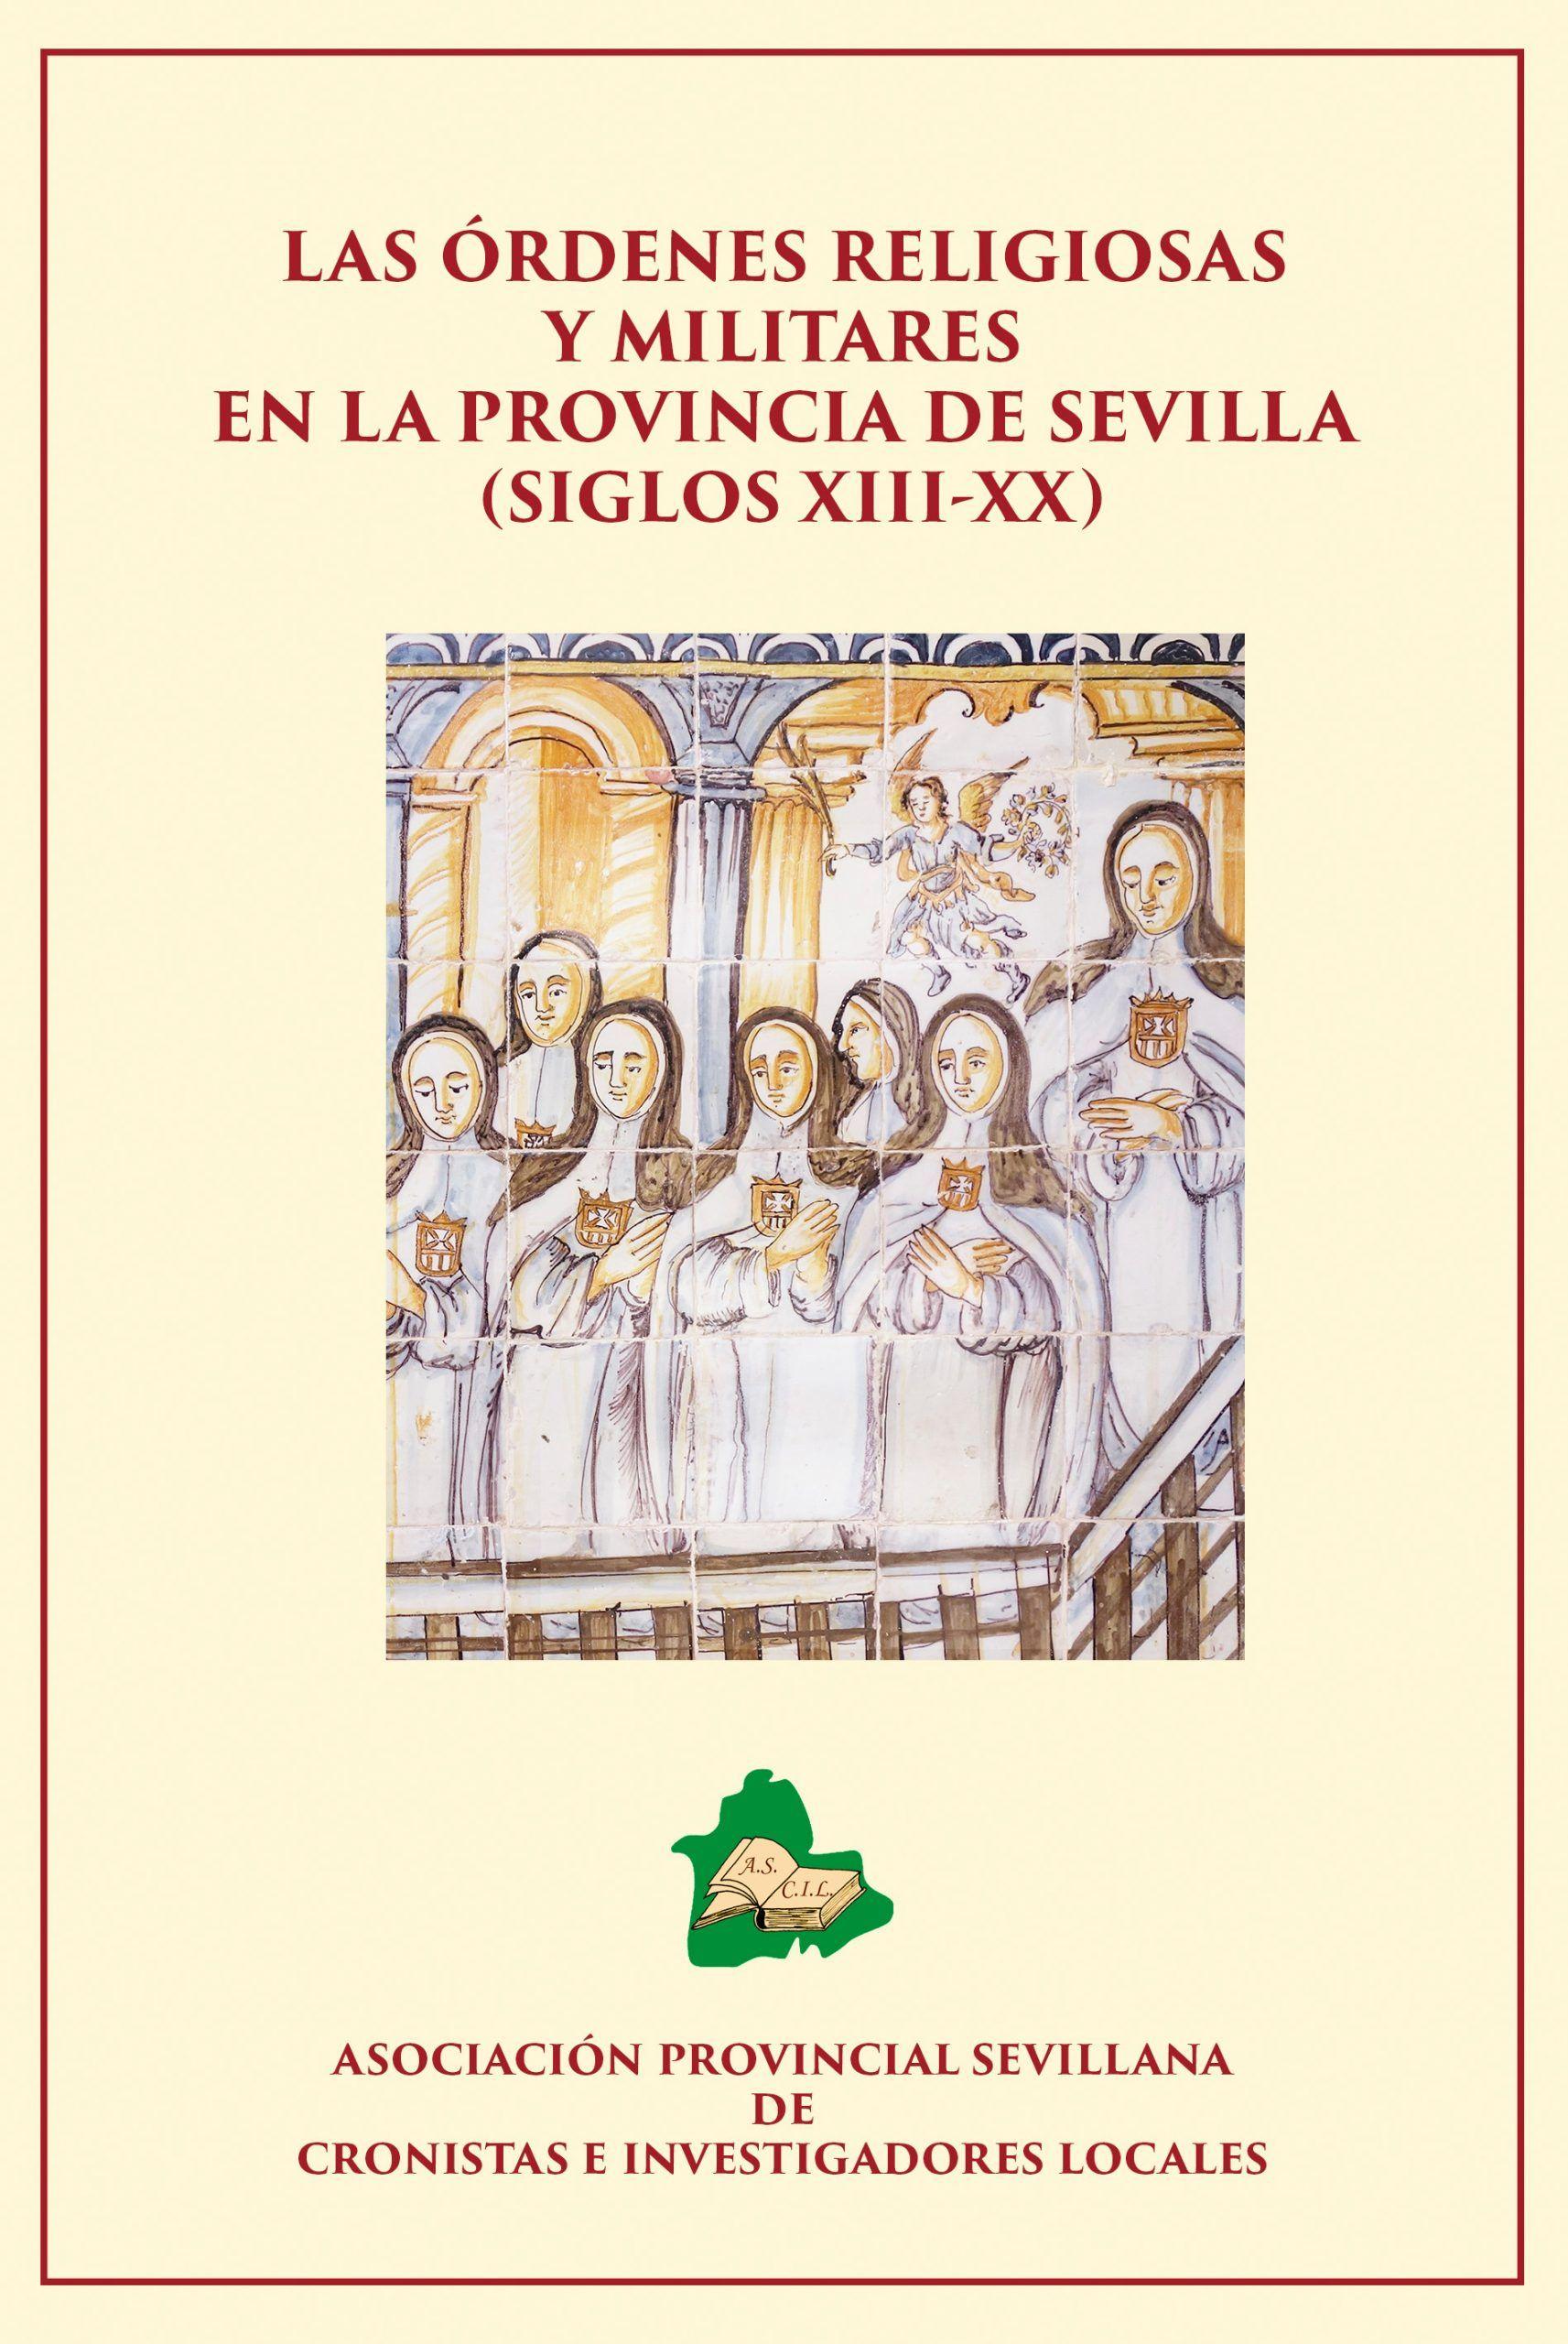 XIII Jornadas de Historia y Patrimonio (ASCIL 2016)